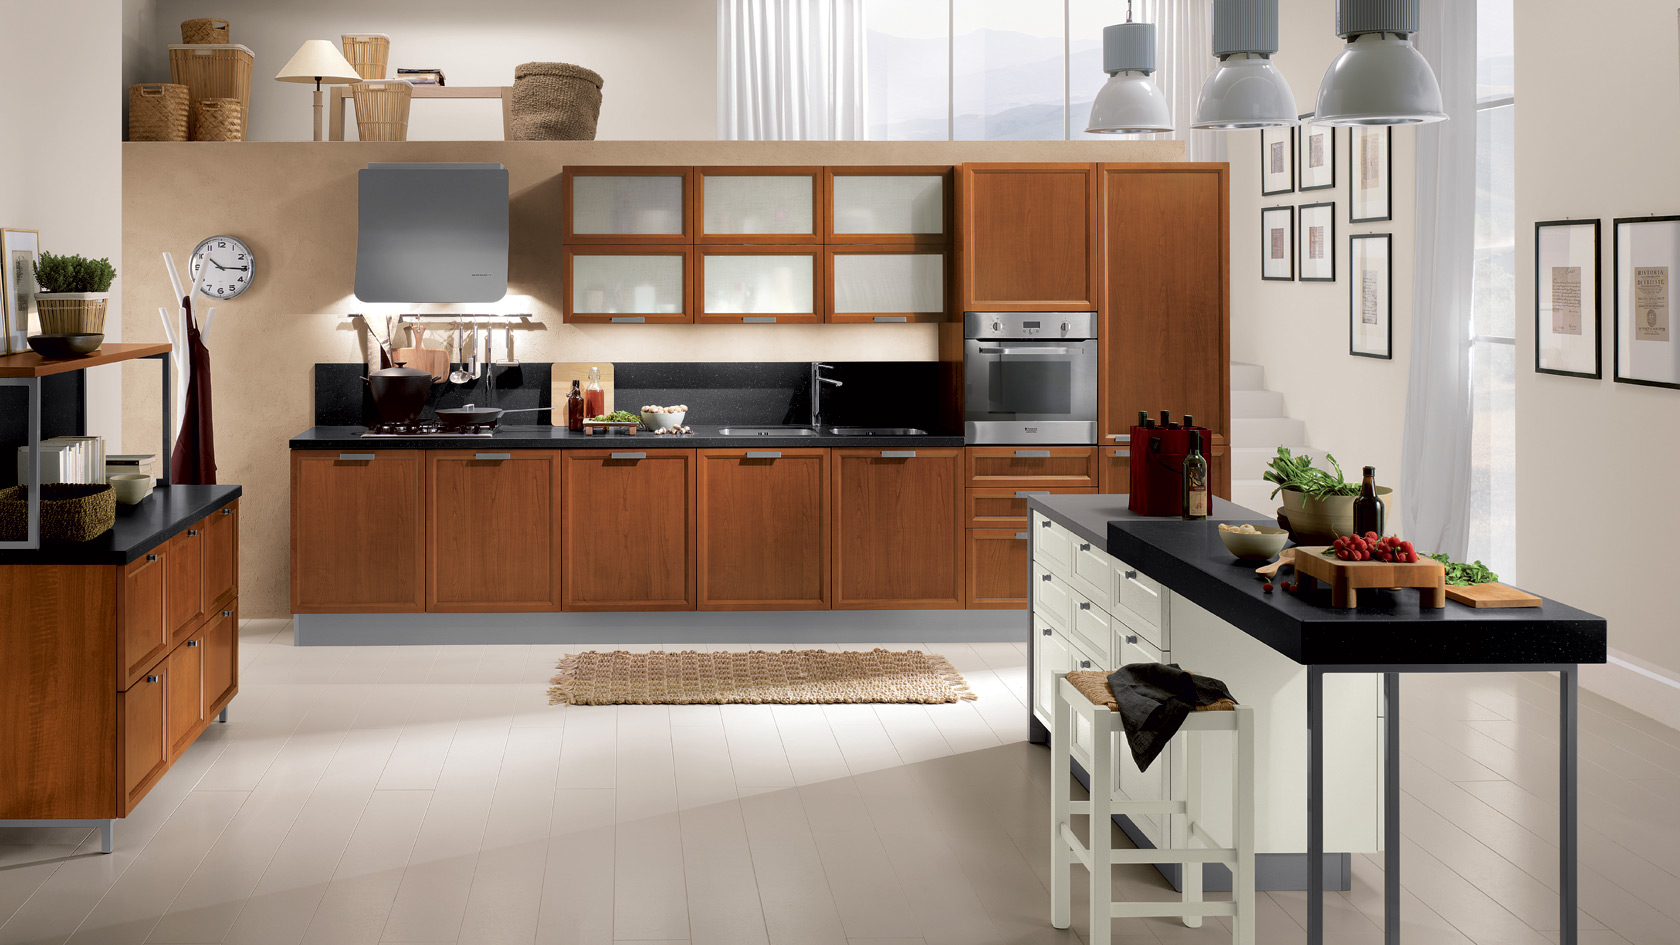 cucina-scavolini-atelier-arredamenti-modena-5 - Arredamenti Casarini ...